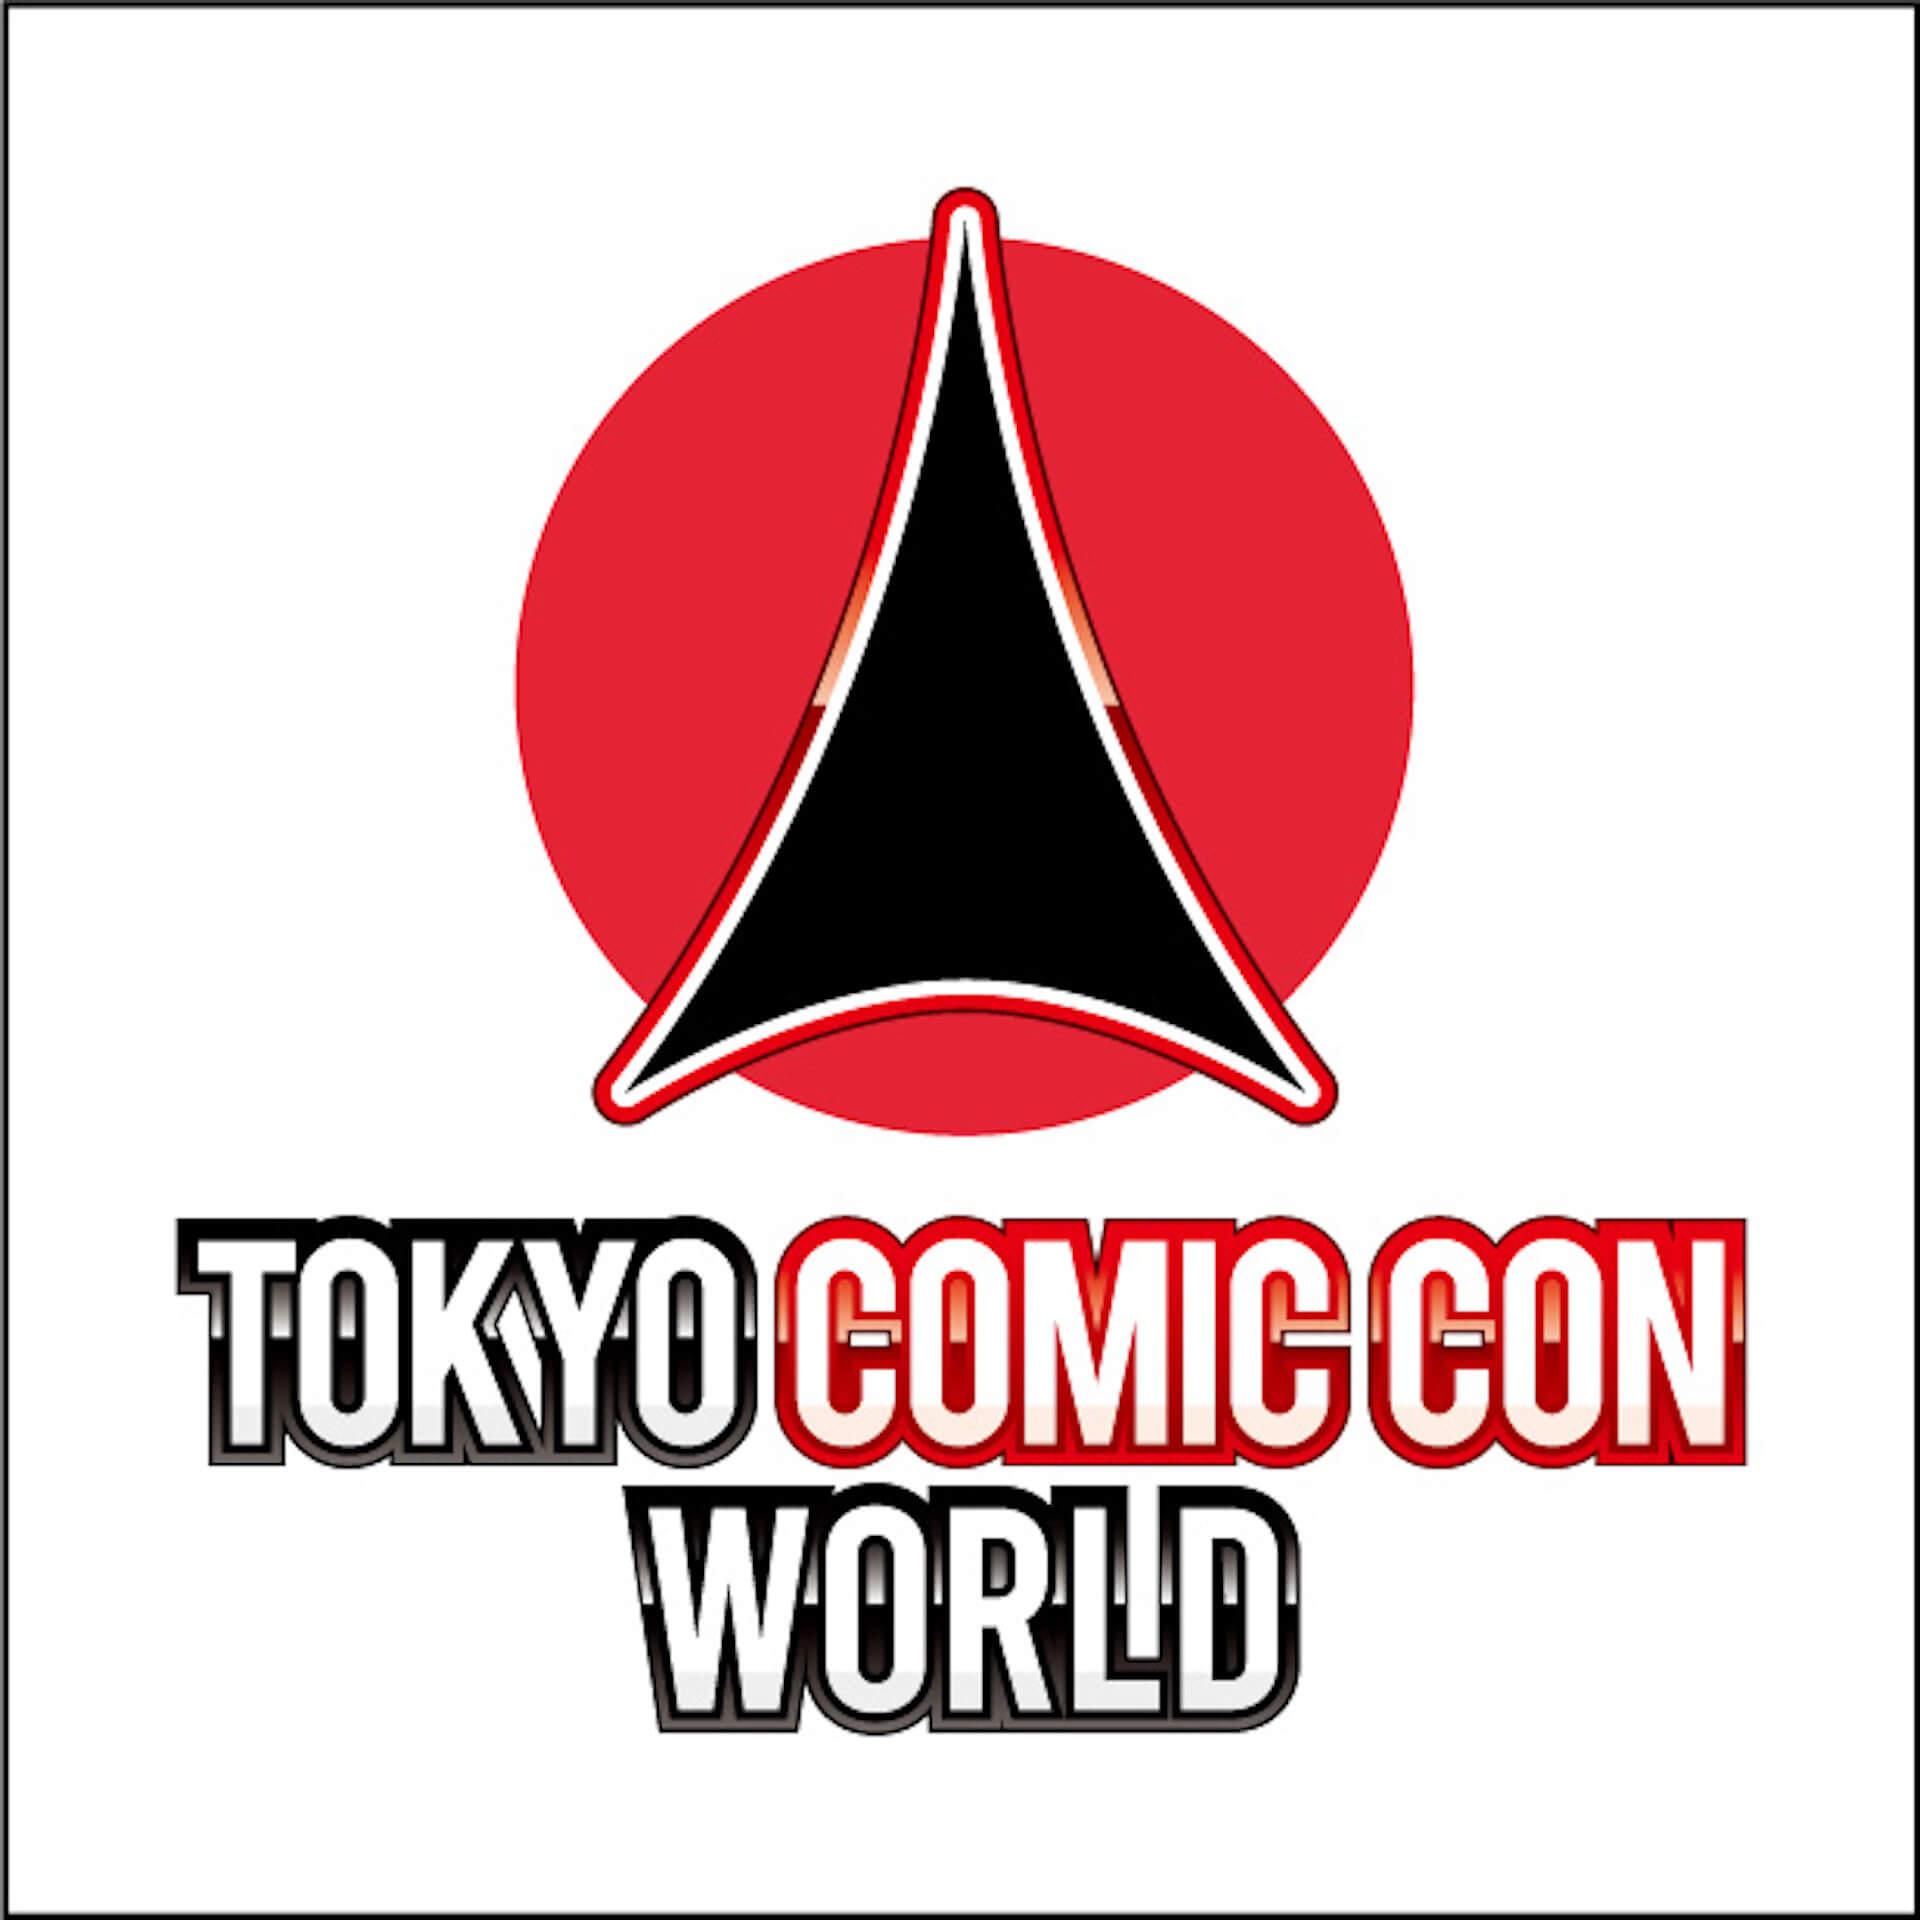 『24 -TWENTY FOUR-』のジャック・バウアーが東京コミコンに登場!キーファー・サザーランドがサイン会への参加決定 art201102_tokyocomicon_1